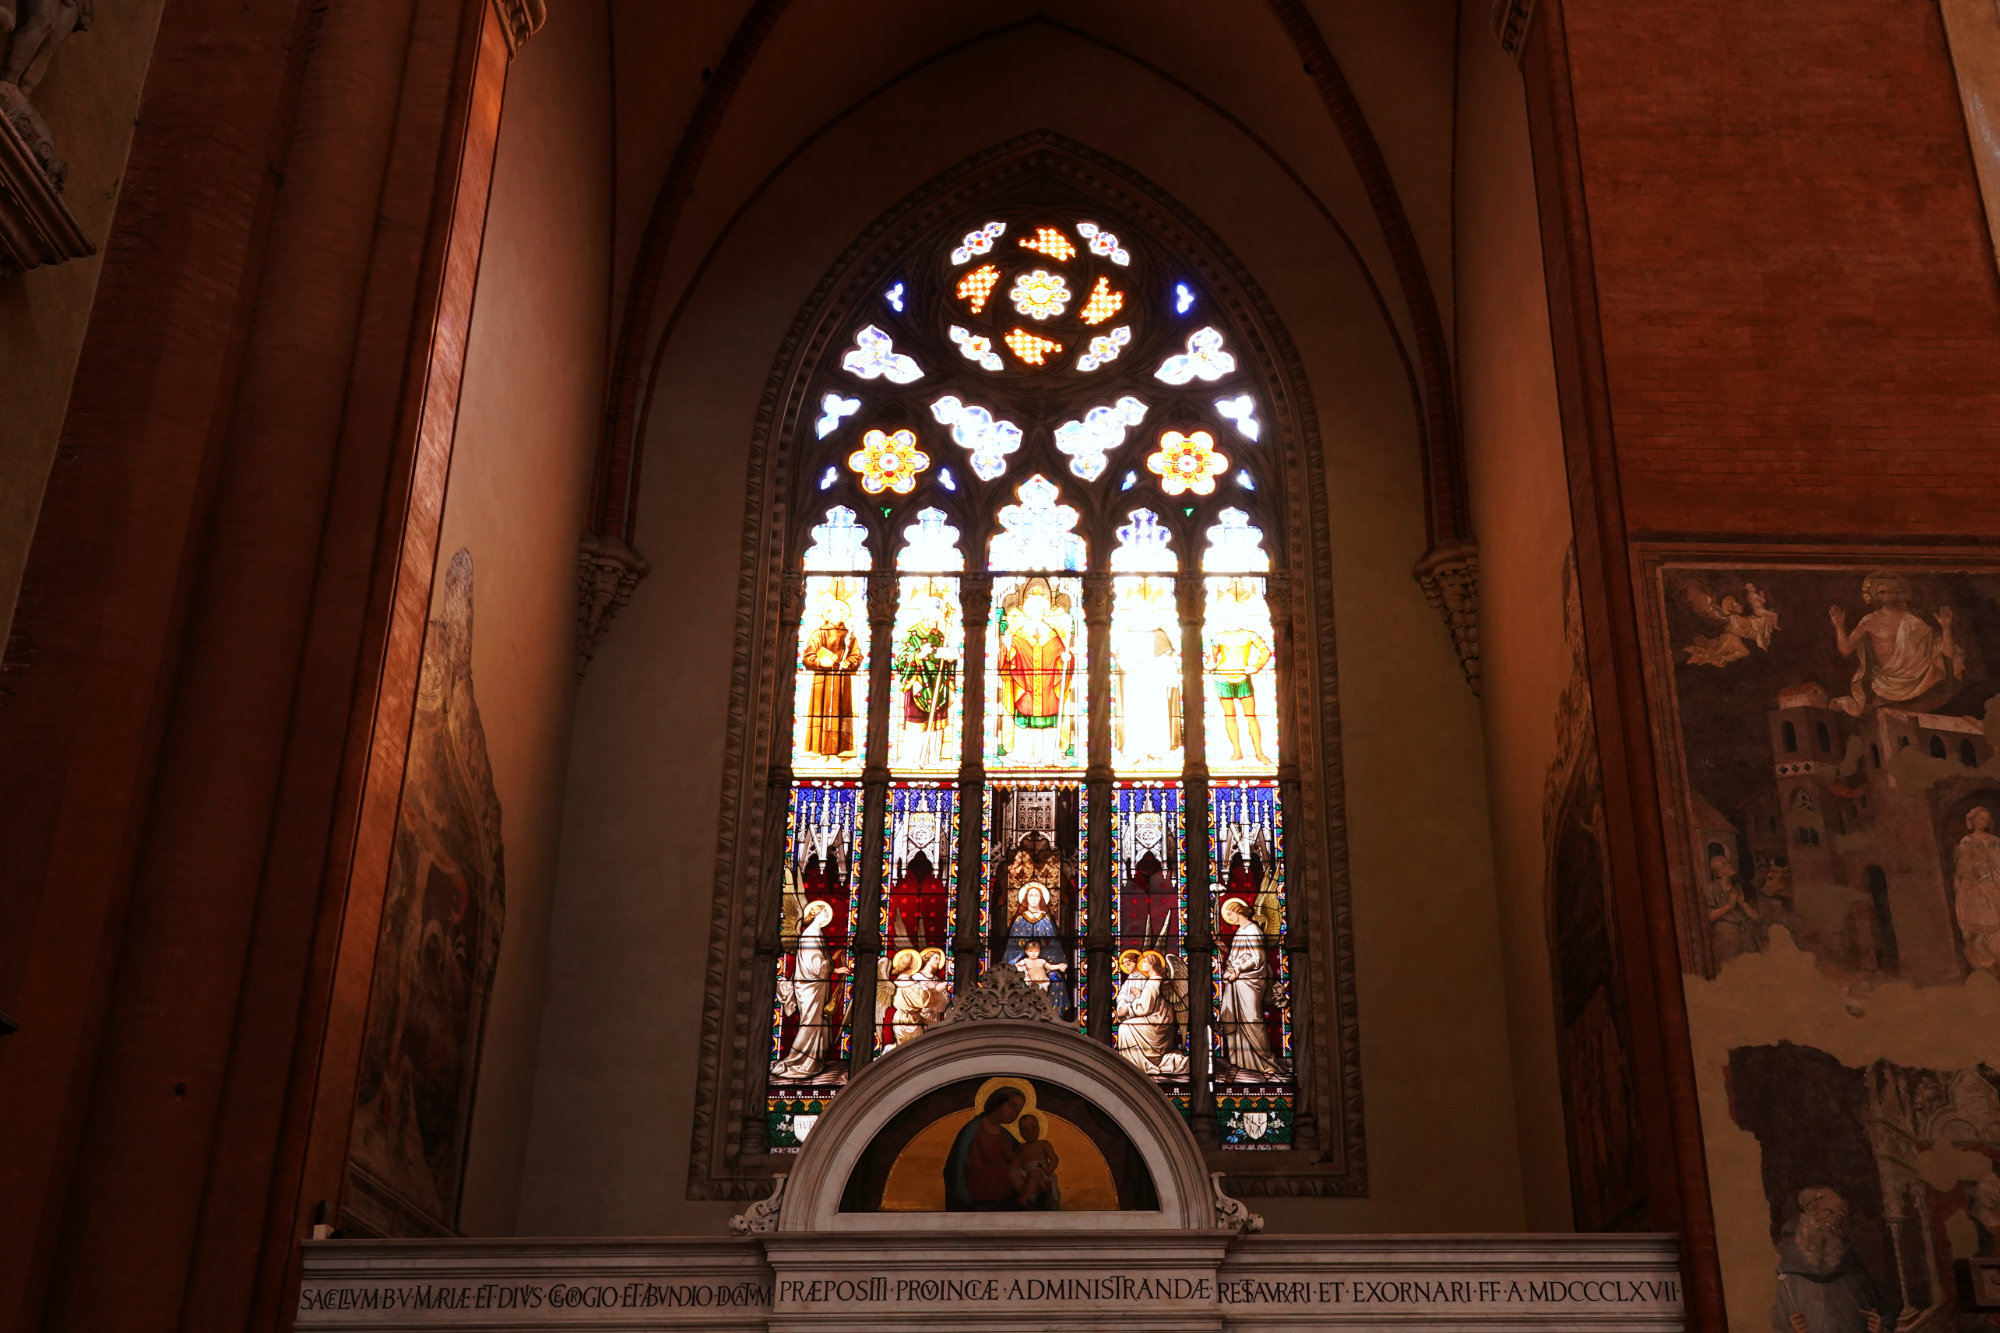 Bologna Basilika San Petronio Glasfenster